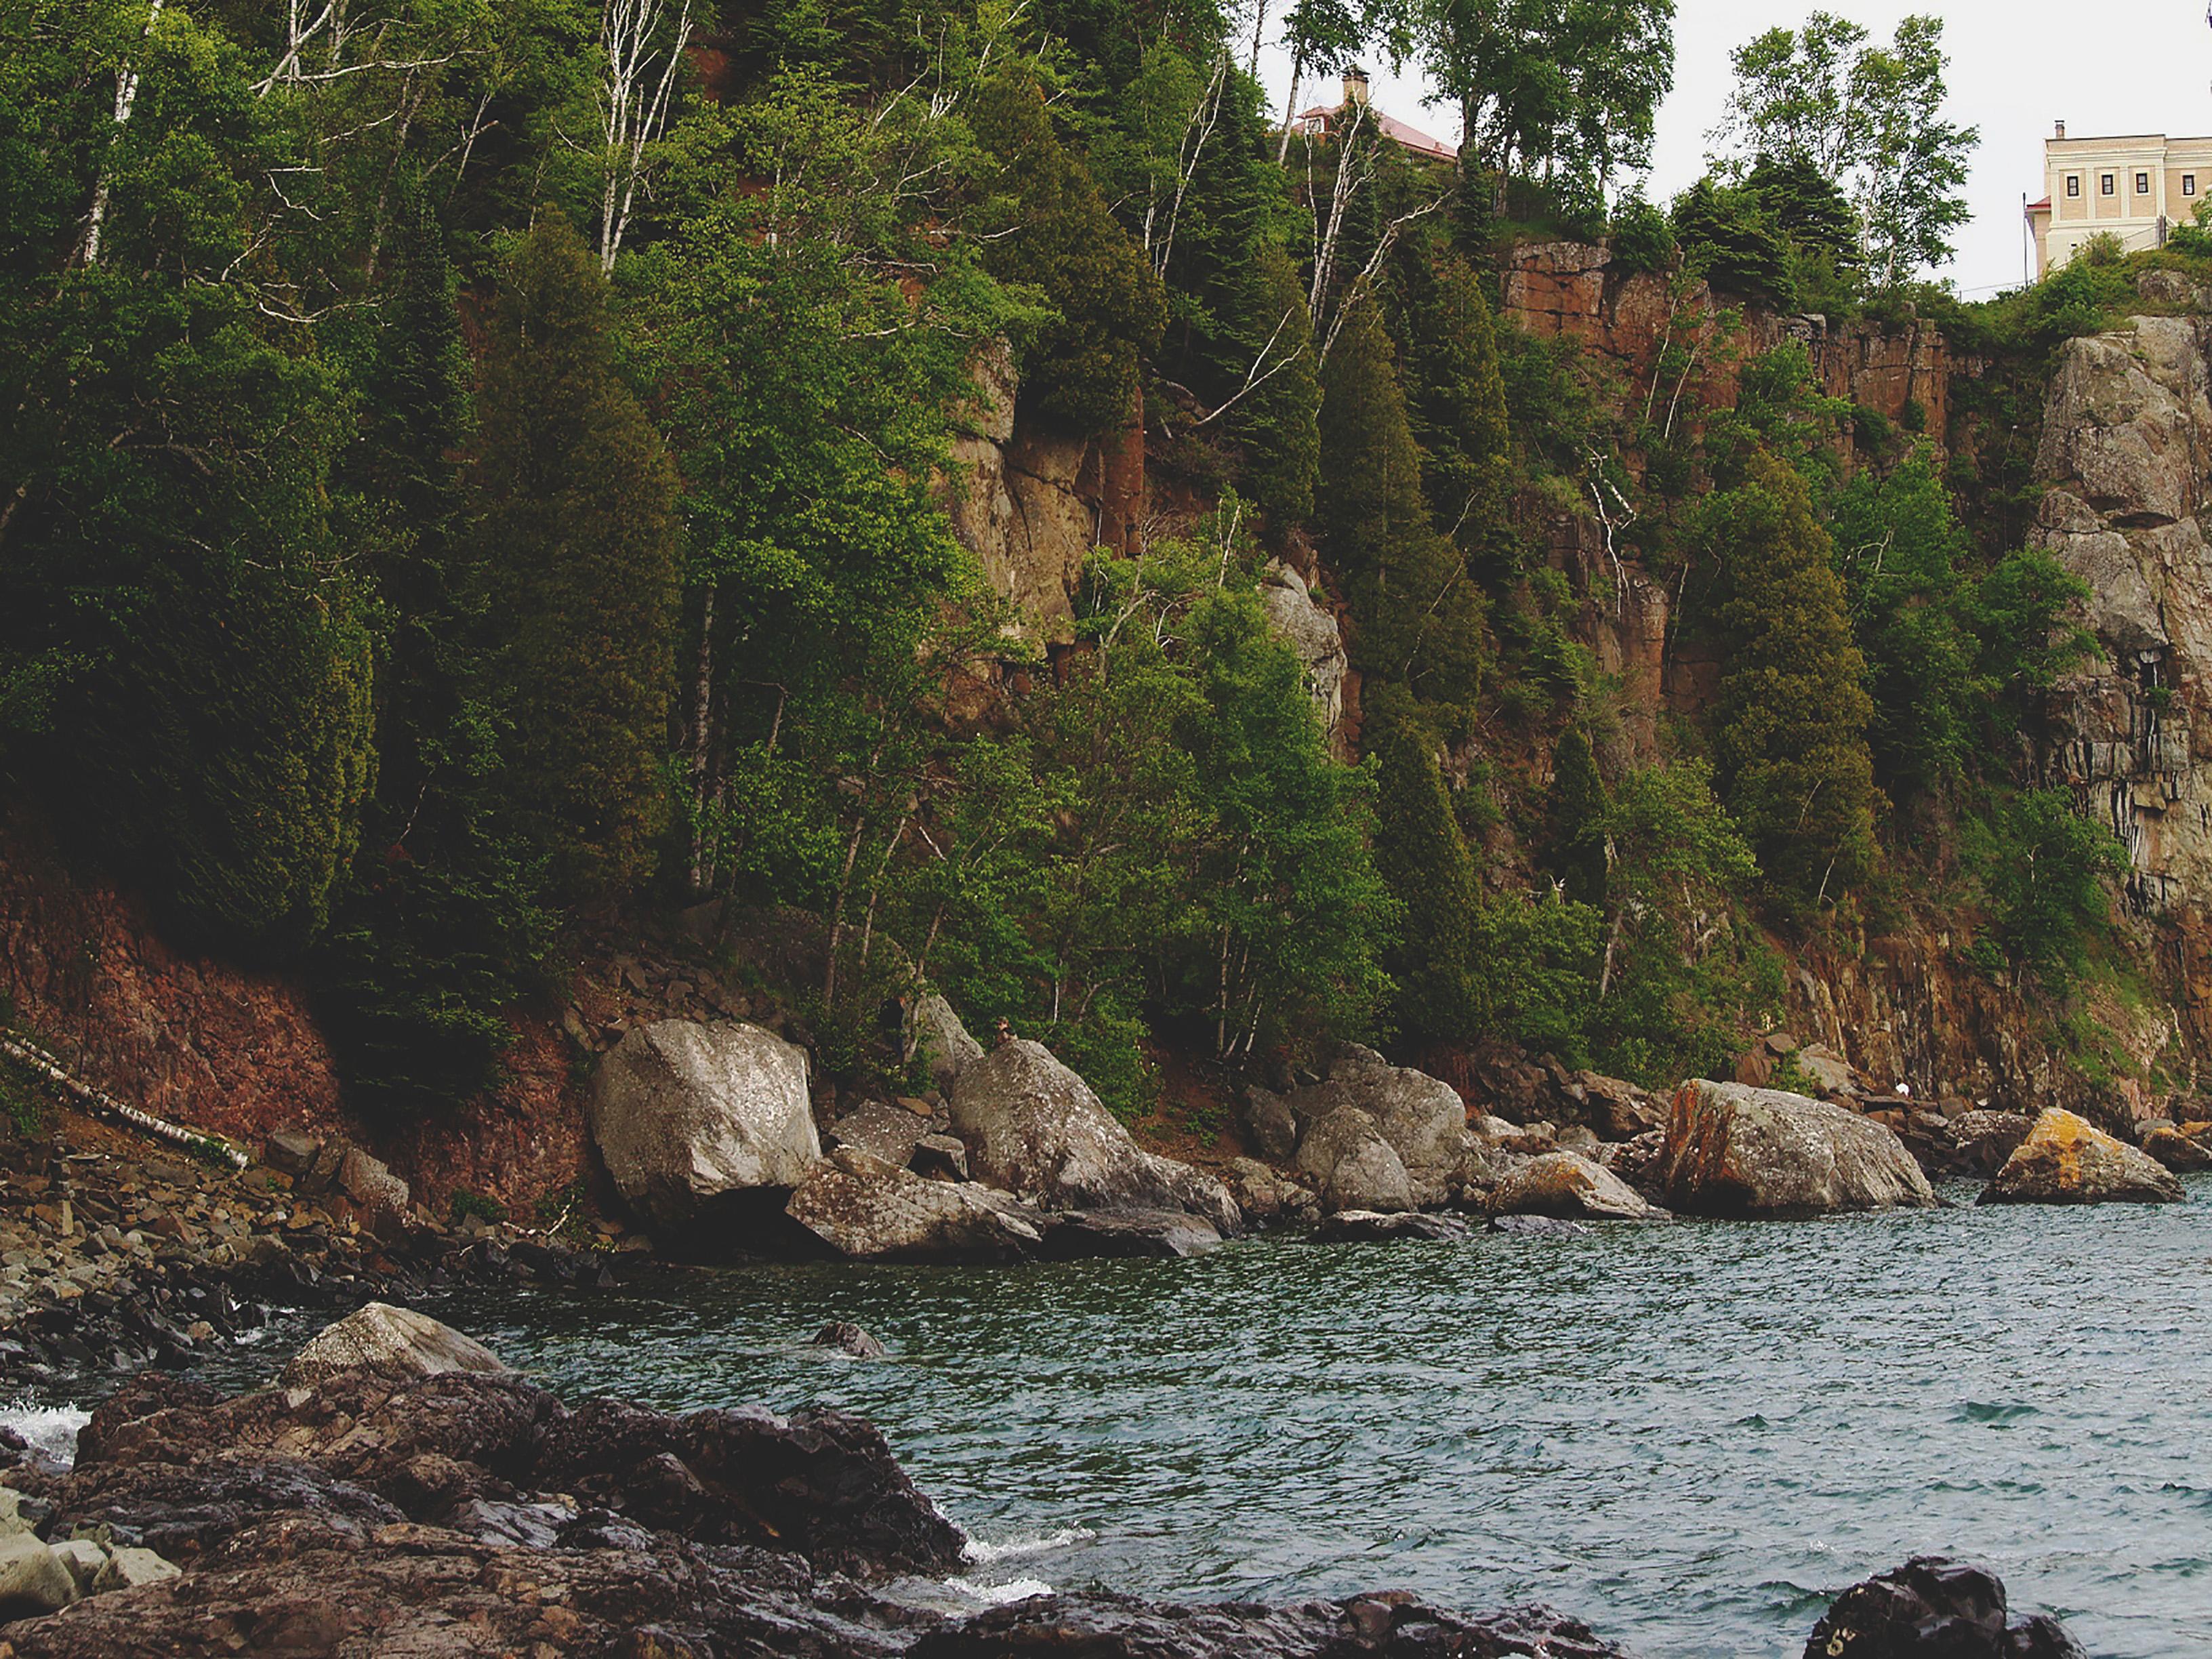 Lake Superior: Rightfully Named